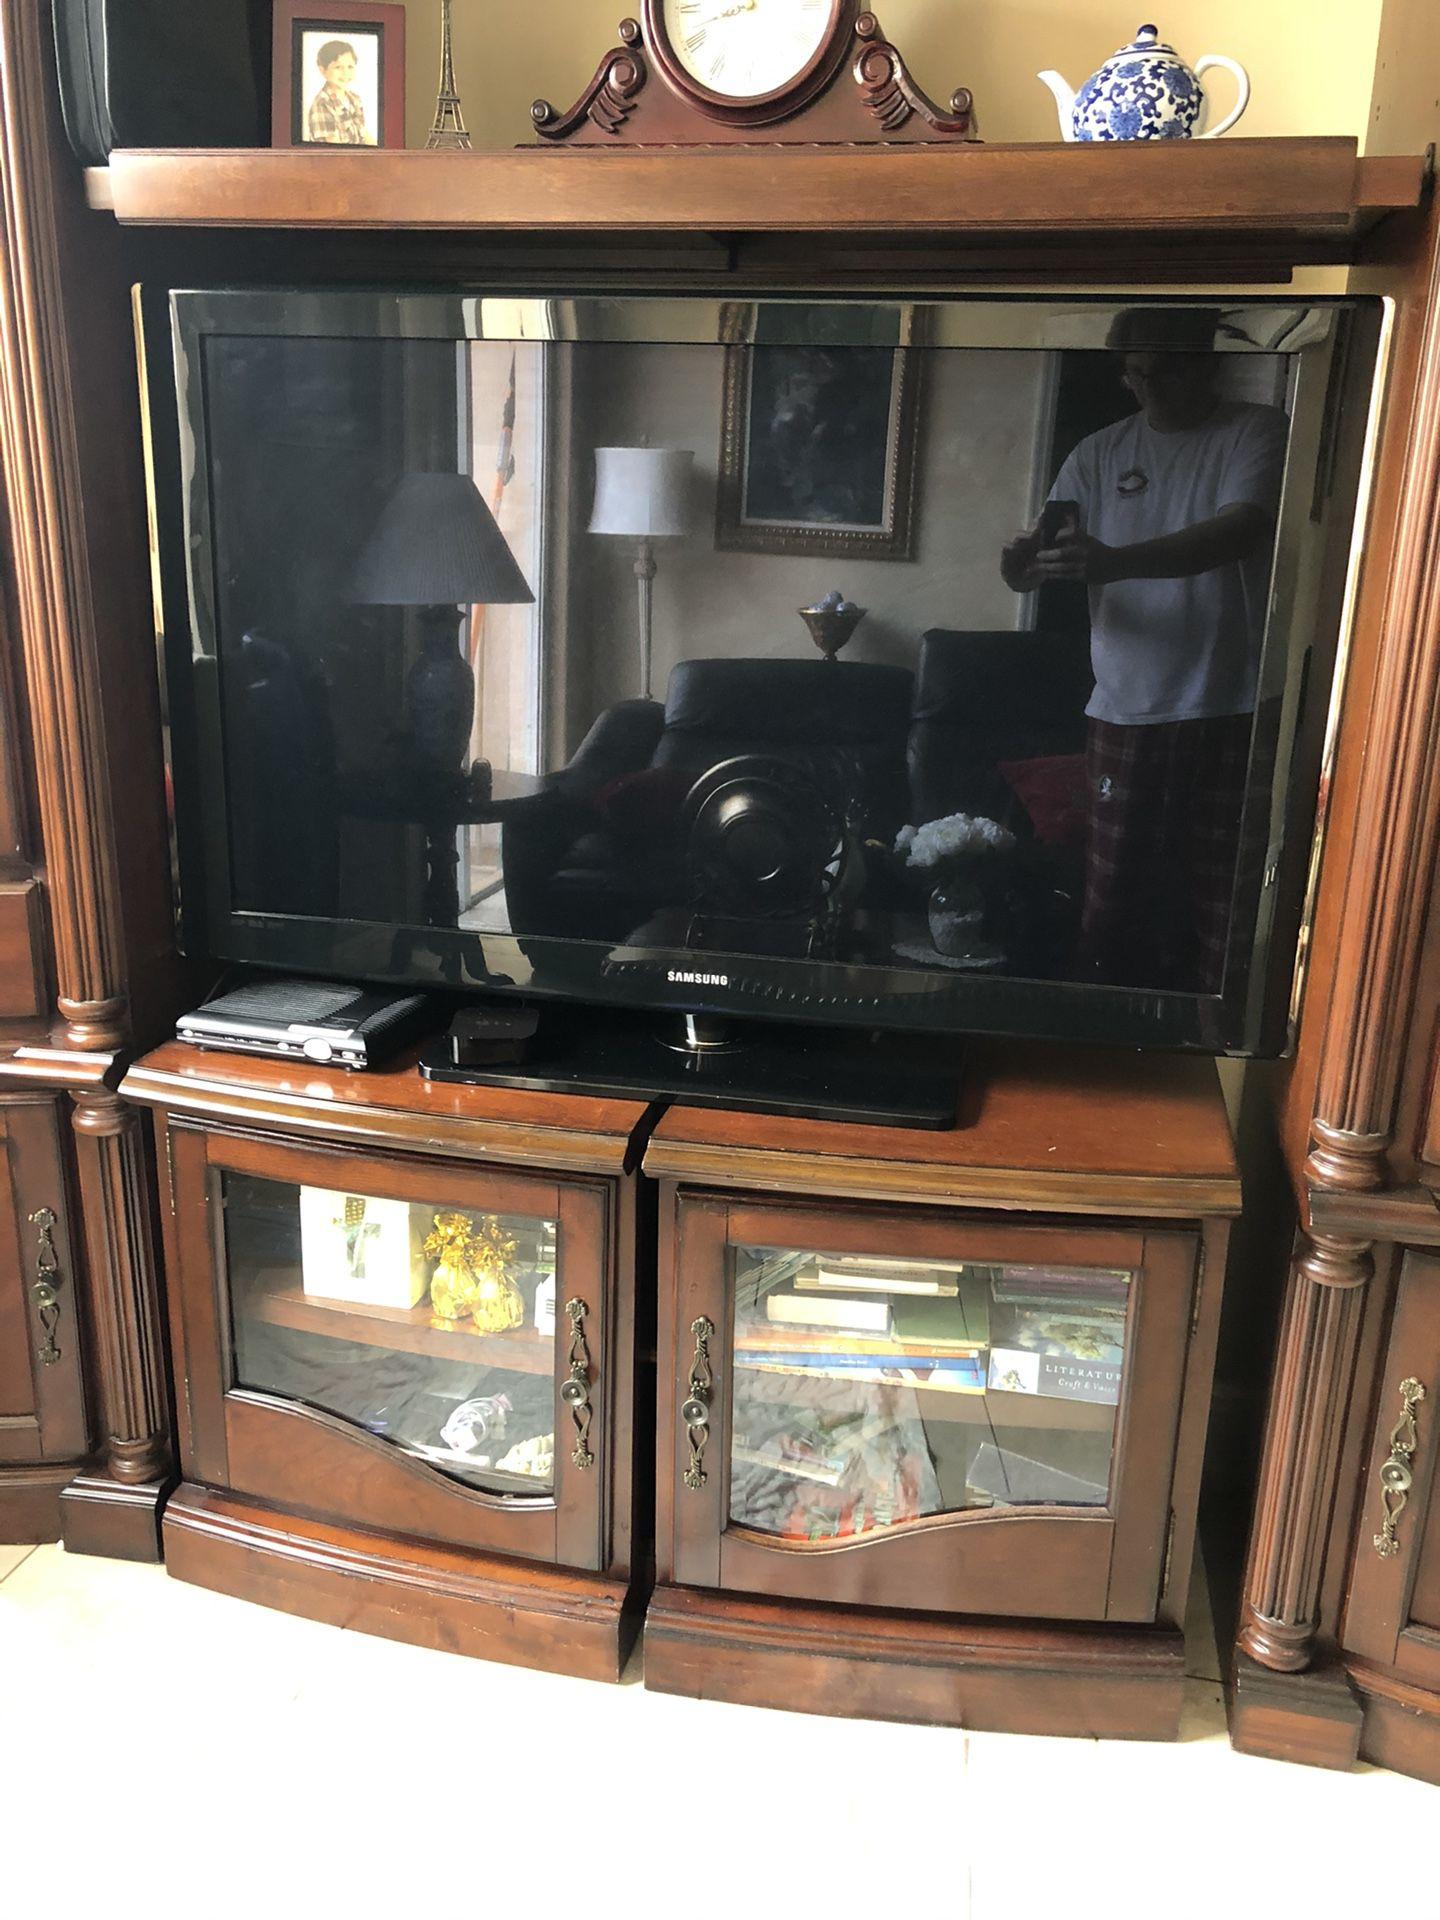 Samsung 52 inch tv 1080p HD